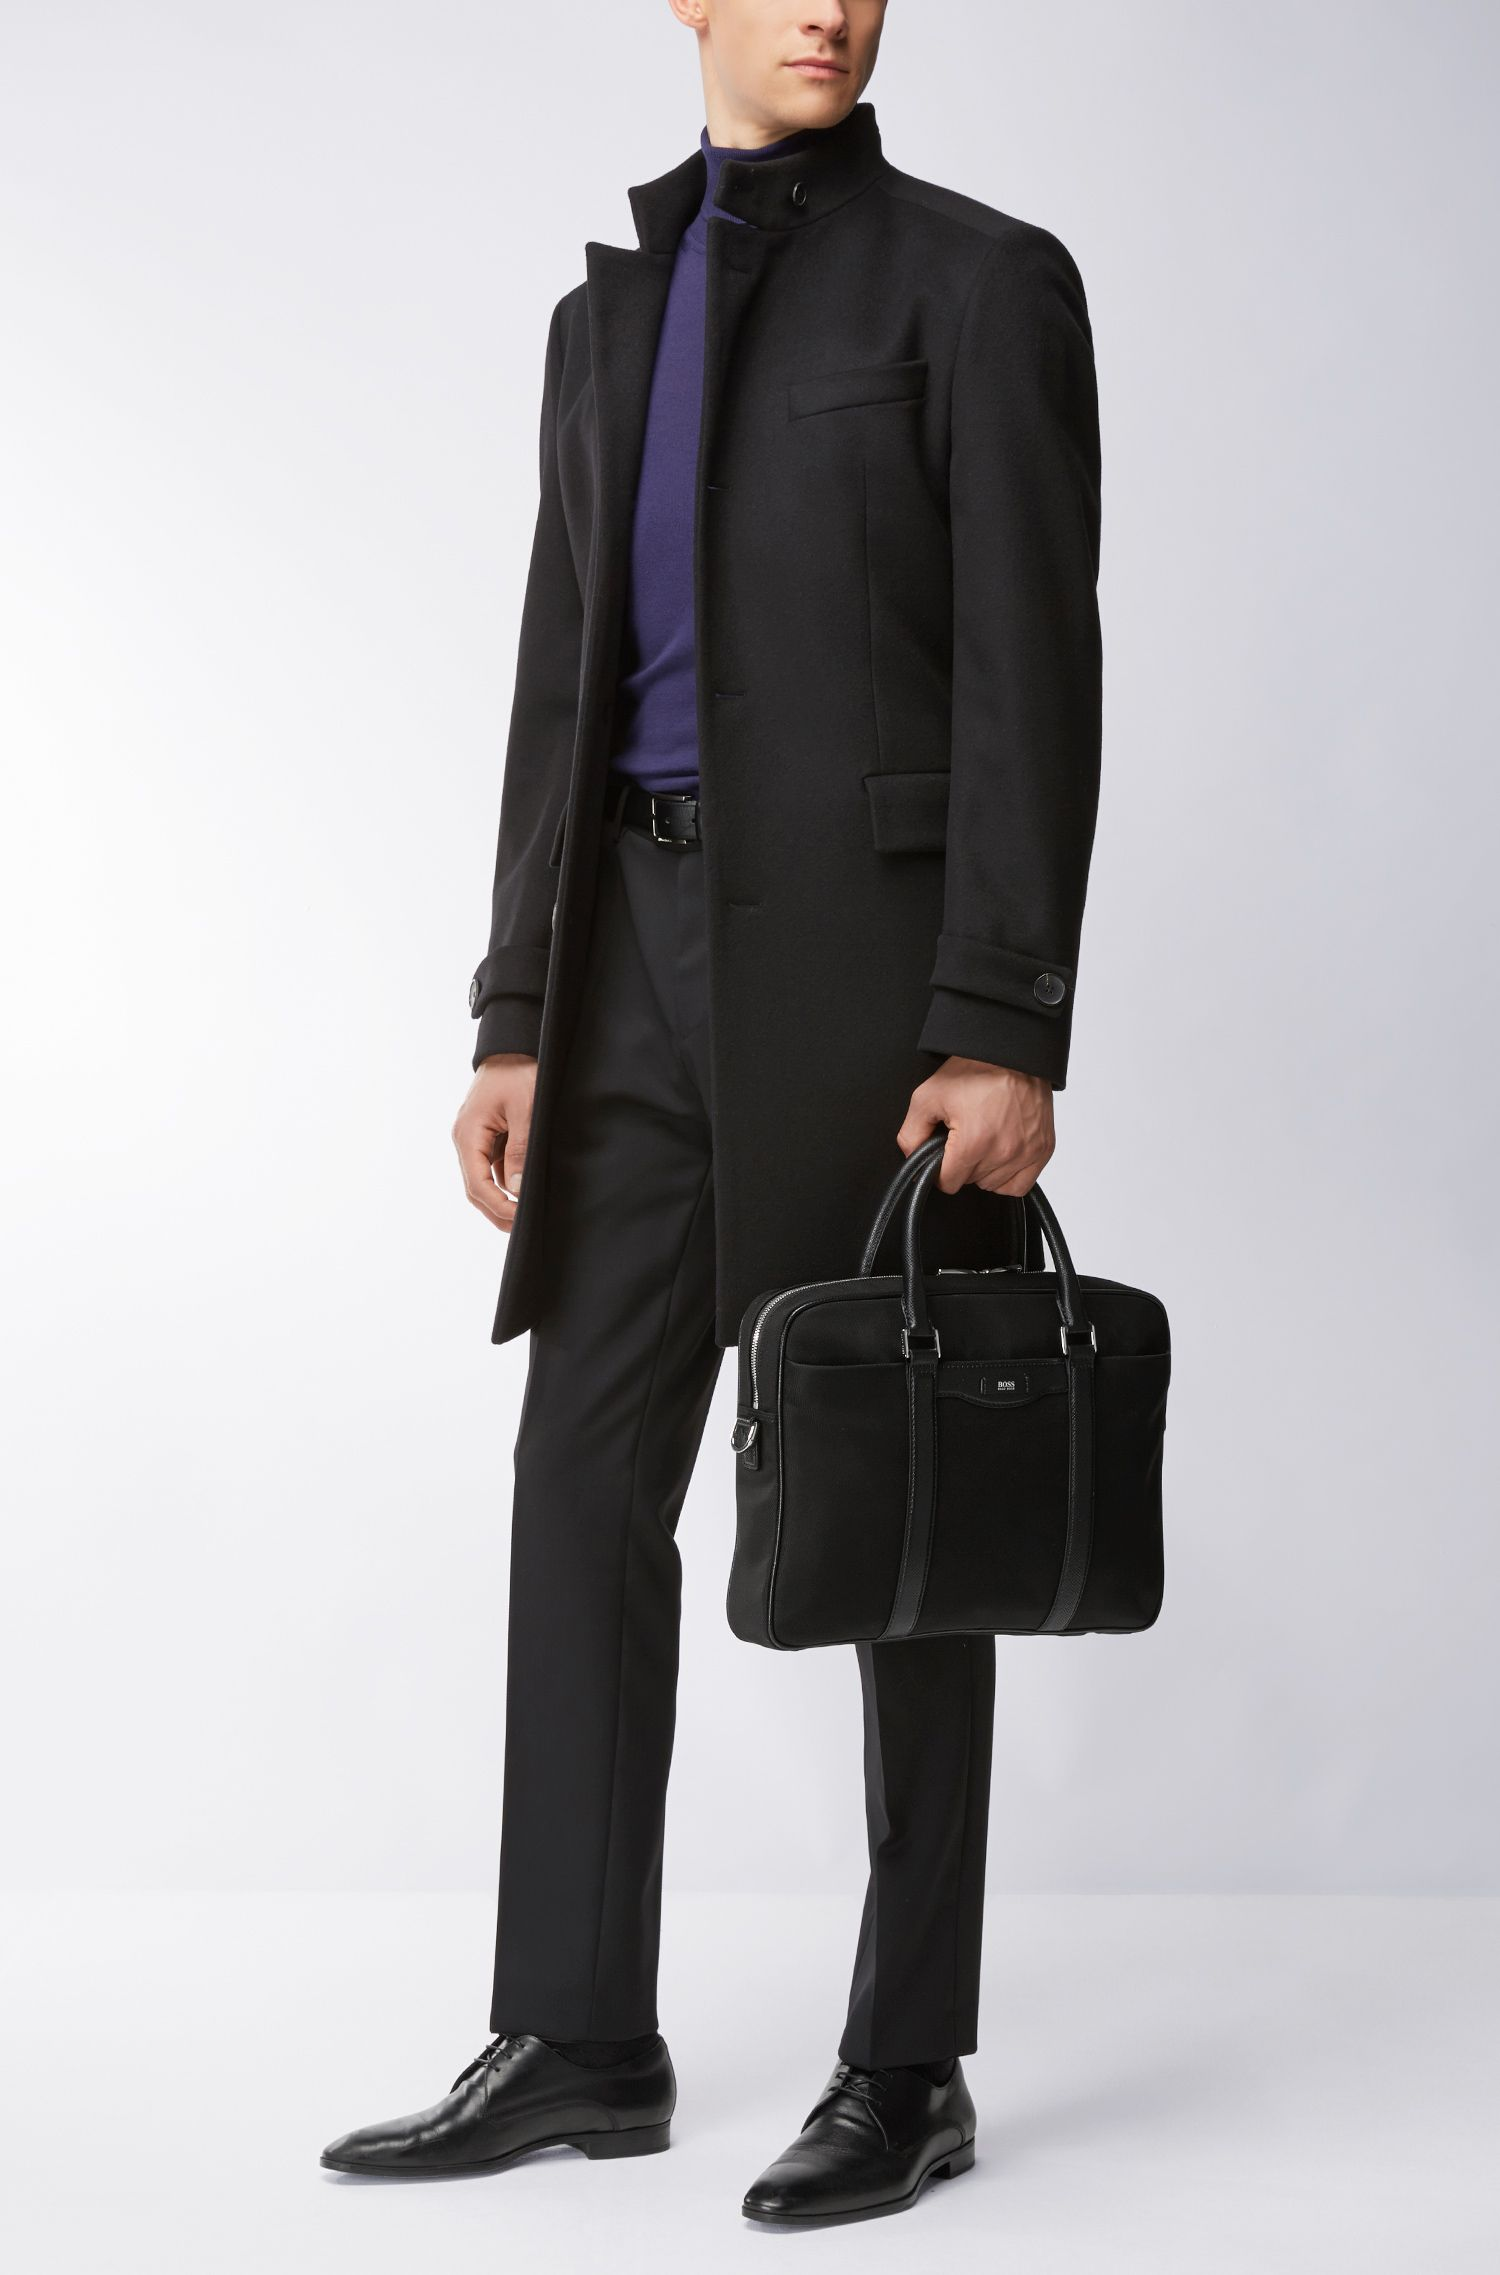 Nylon Blend Workbag | Signature L S Doc, Black